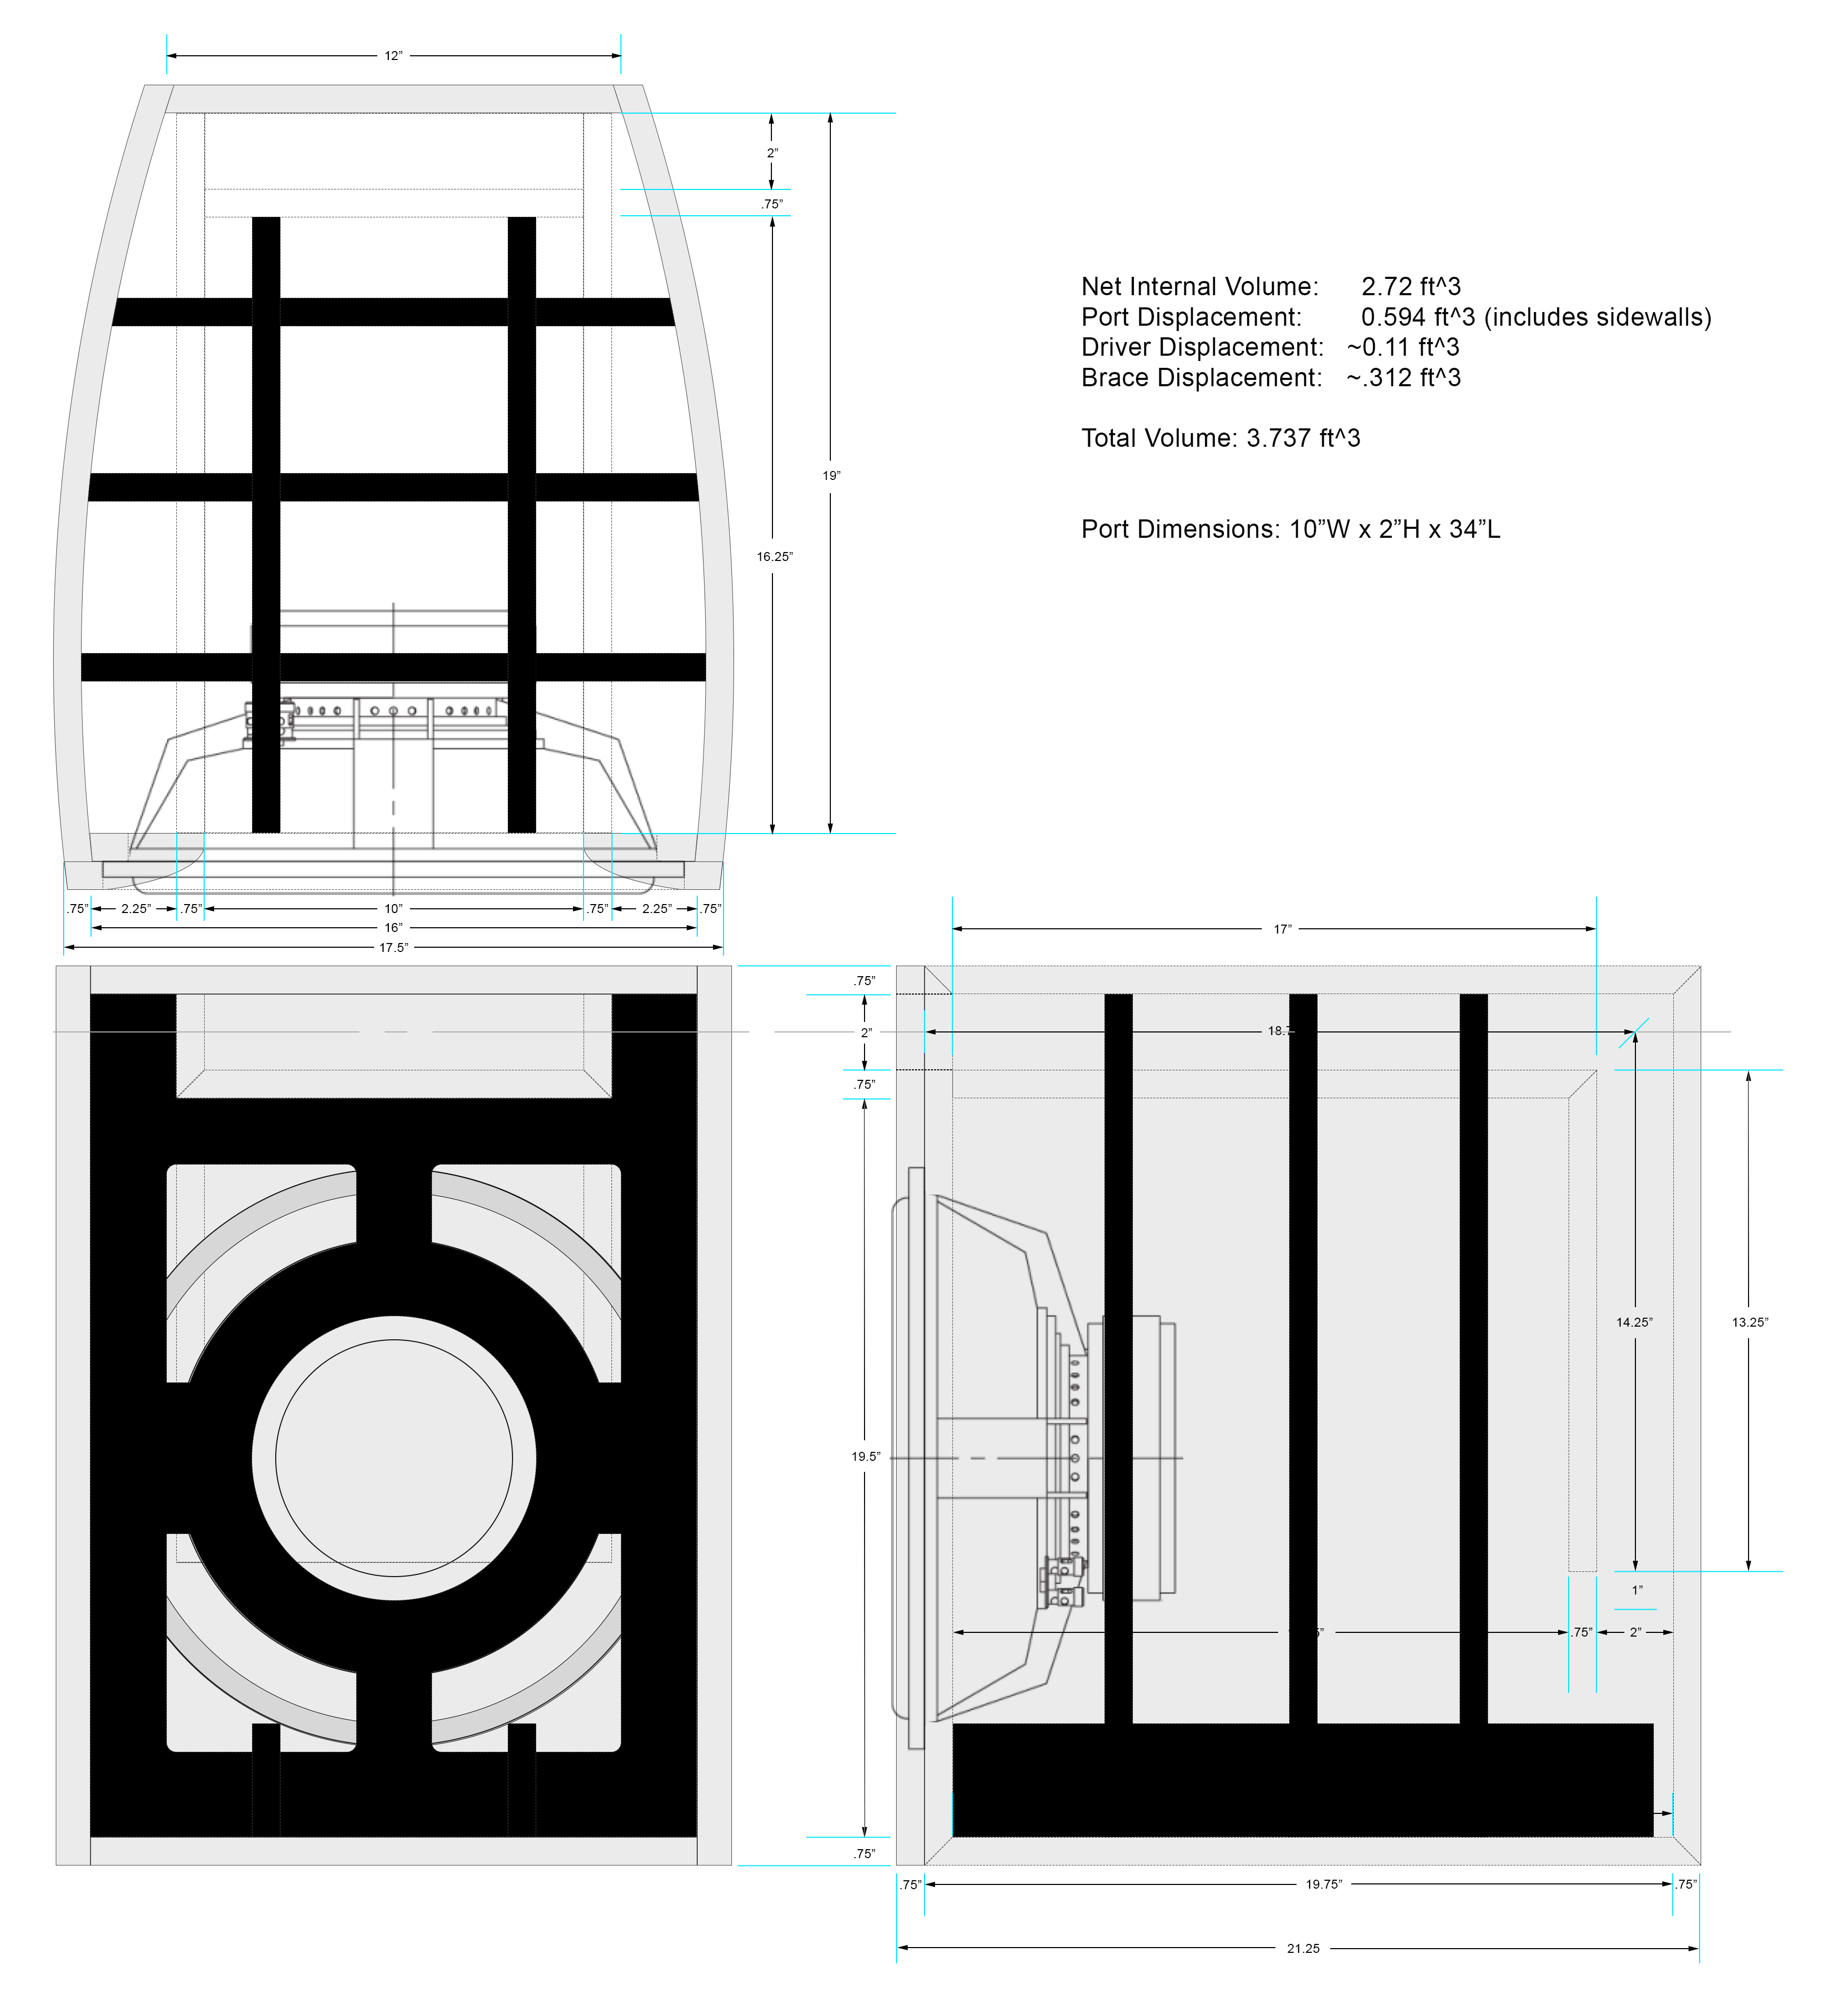 Click image for larger version  Name:RSS390HO_BuildPlans_BraceLayout.png Views:131 Size:561.4 KB ID:2264492